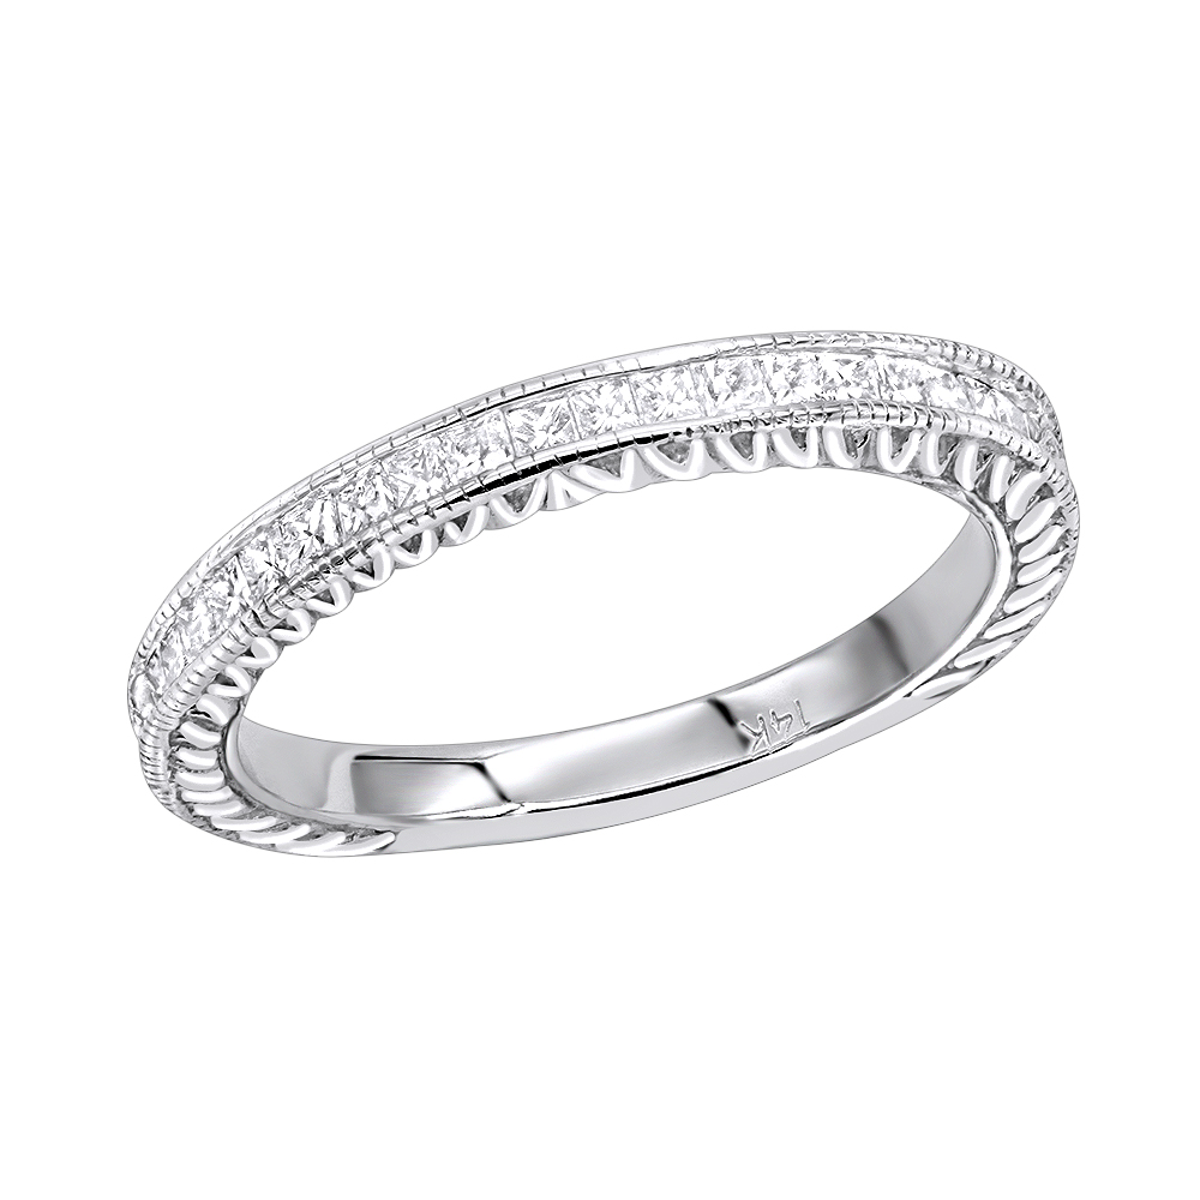 14K Gold Princess Cut Diamond Wedding Band for Women Vintage Style 0.5ct